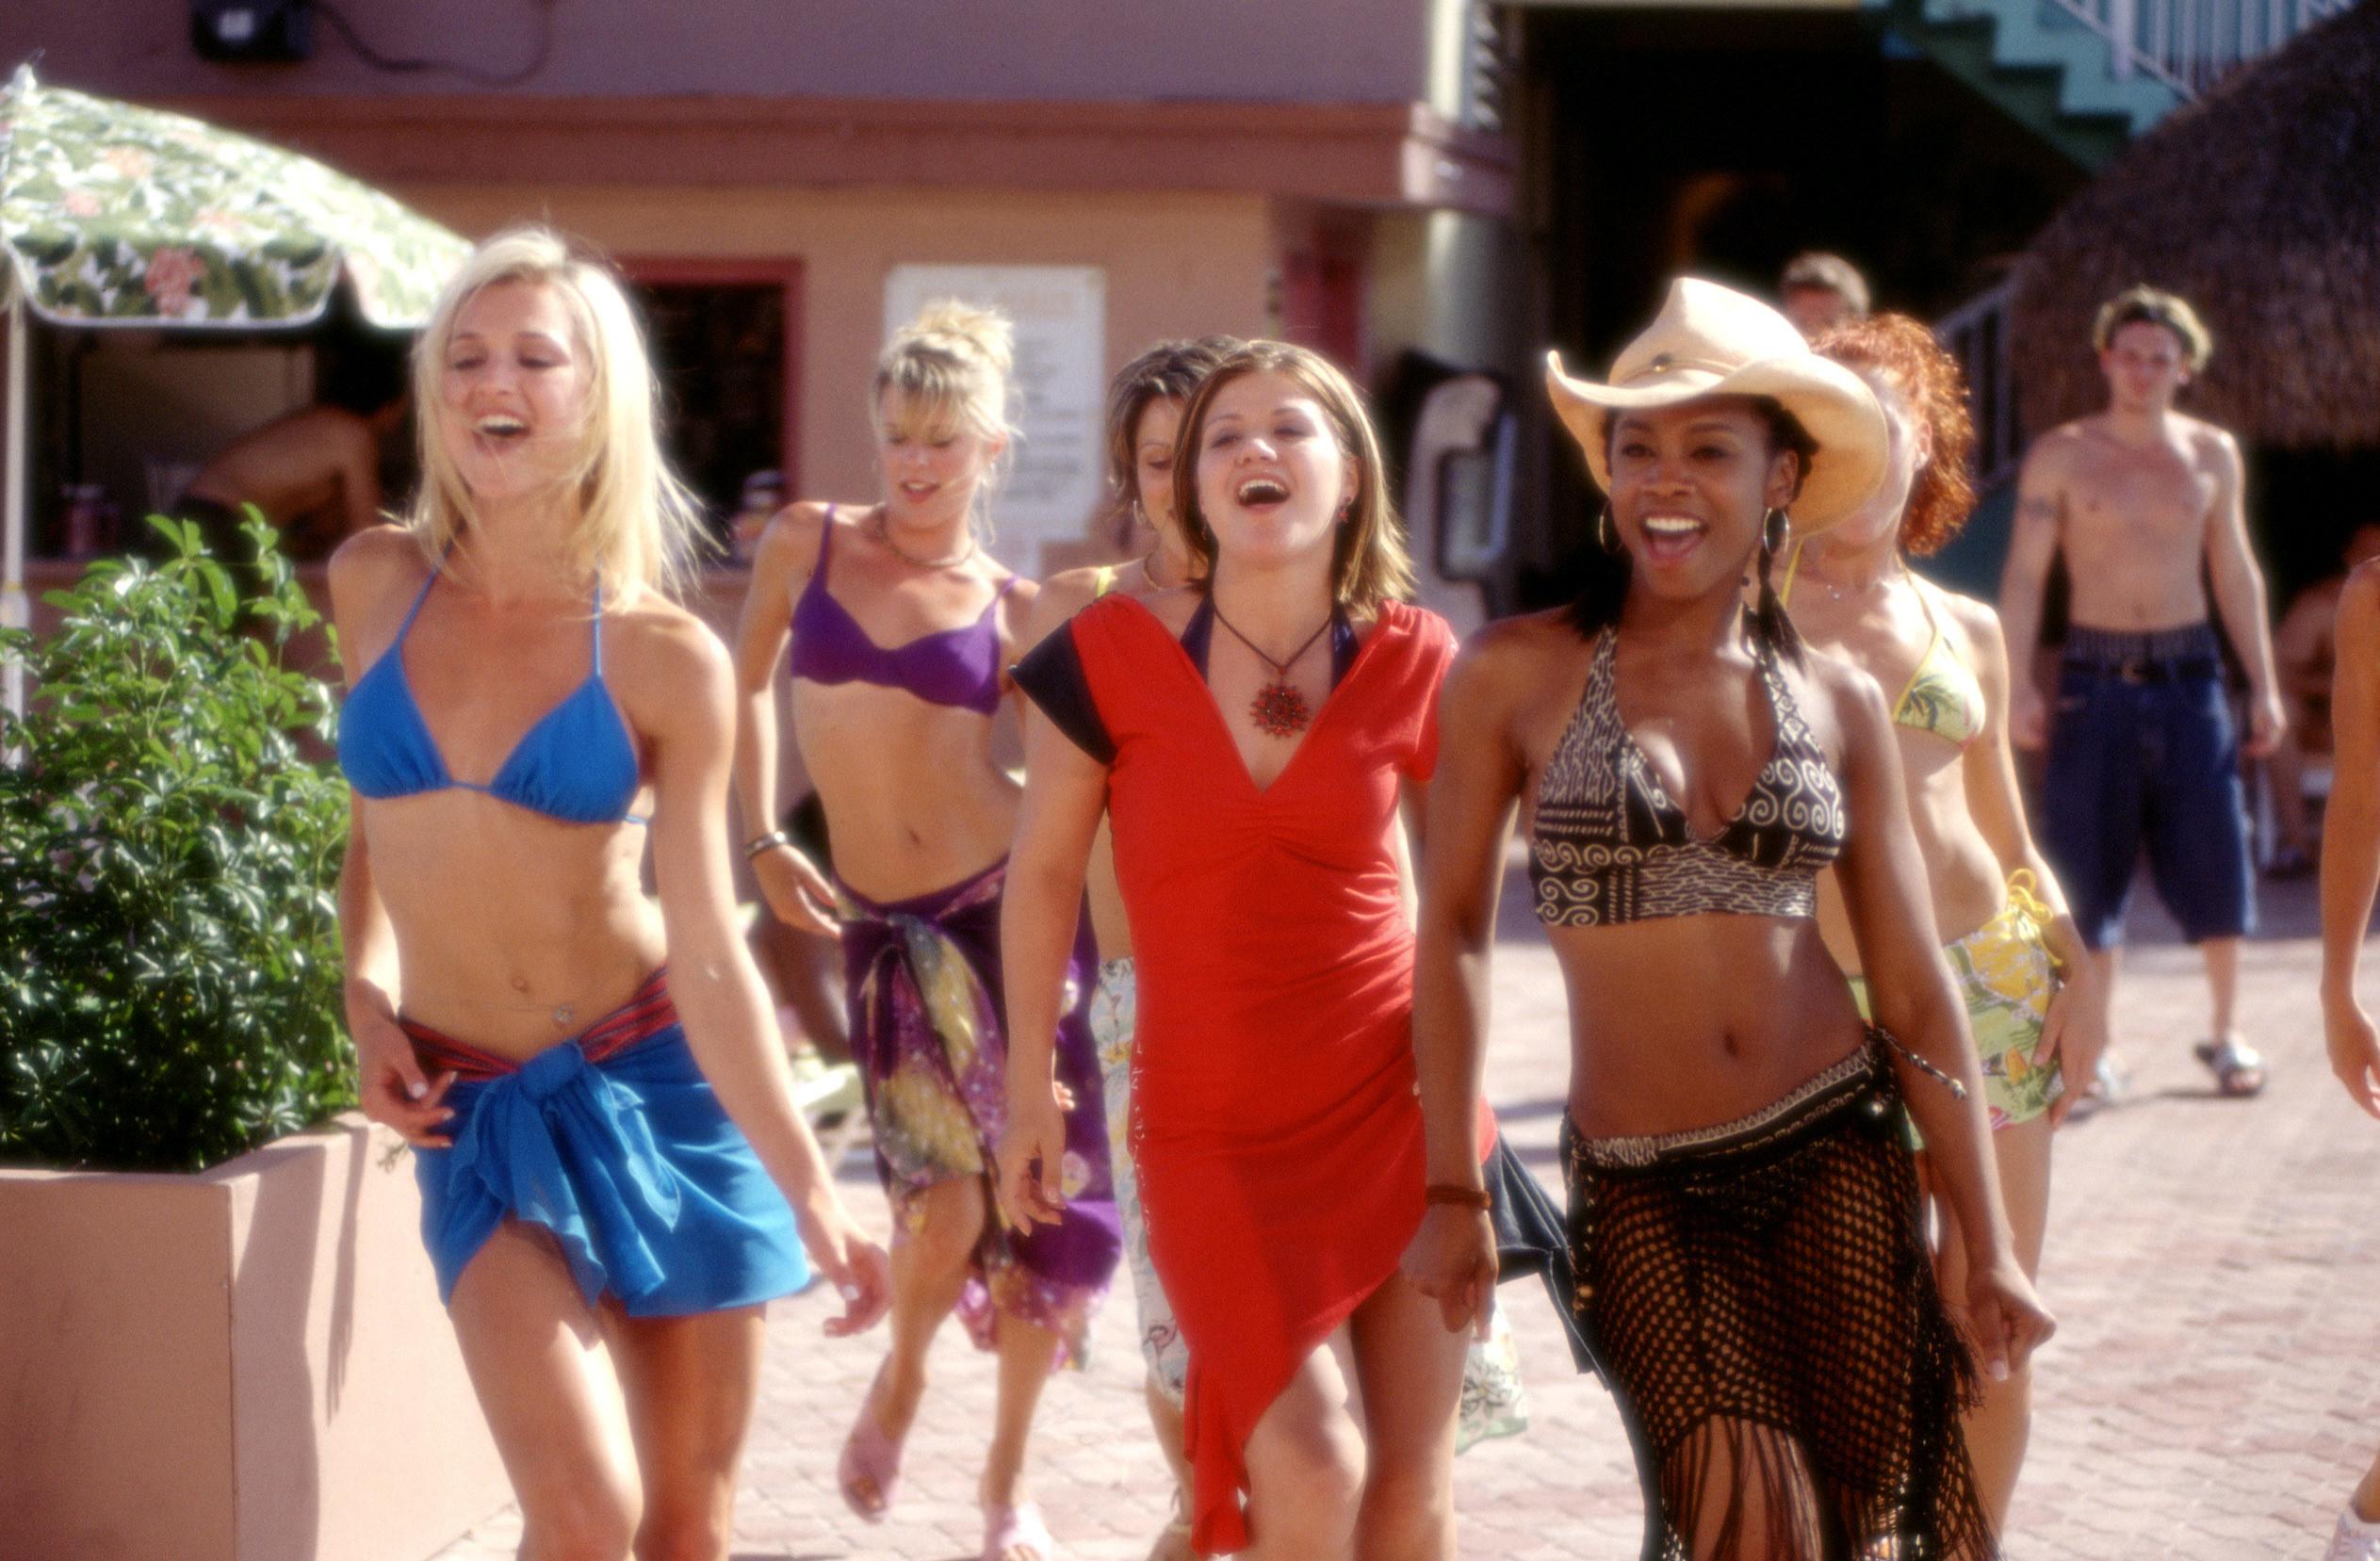 Alexa, Kelly, and Kaya strutting on the beach